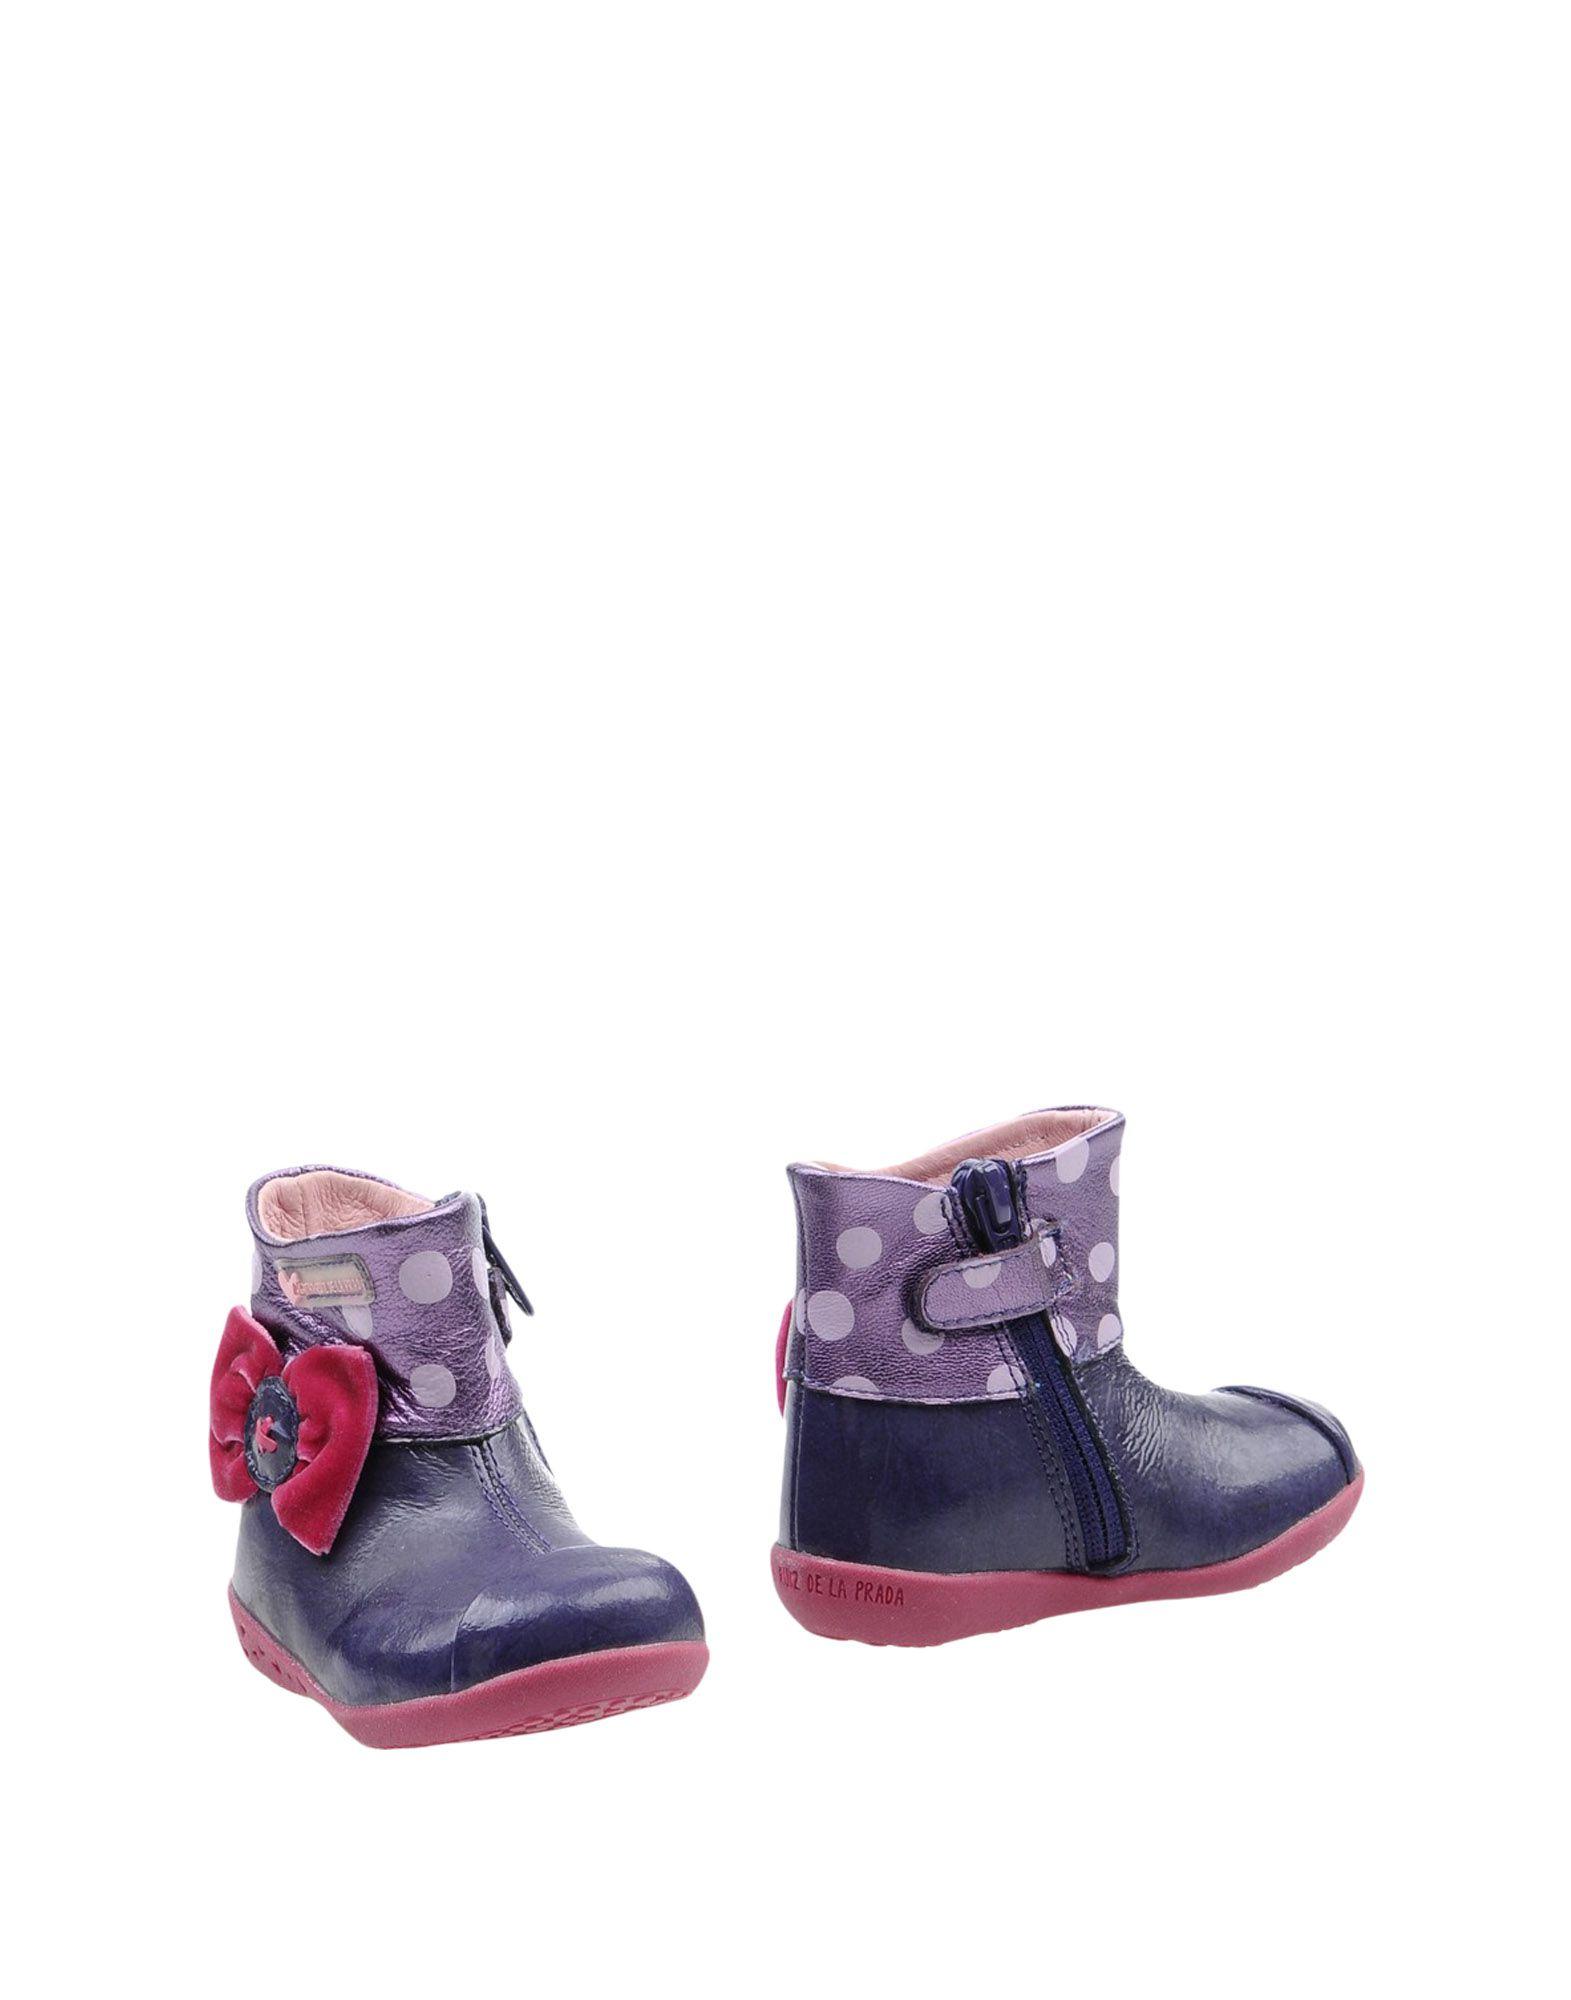 AGATHA RUIZ DE LA PRADA Полусапоги и высокие ботинки agatha ruiz de la prada легинсы